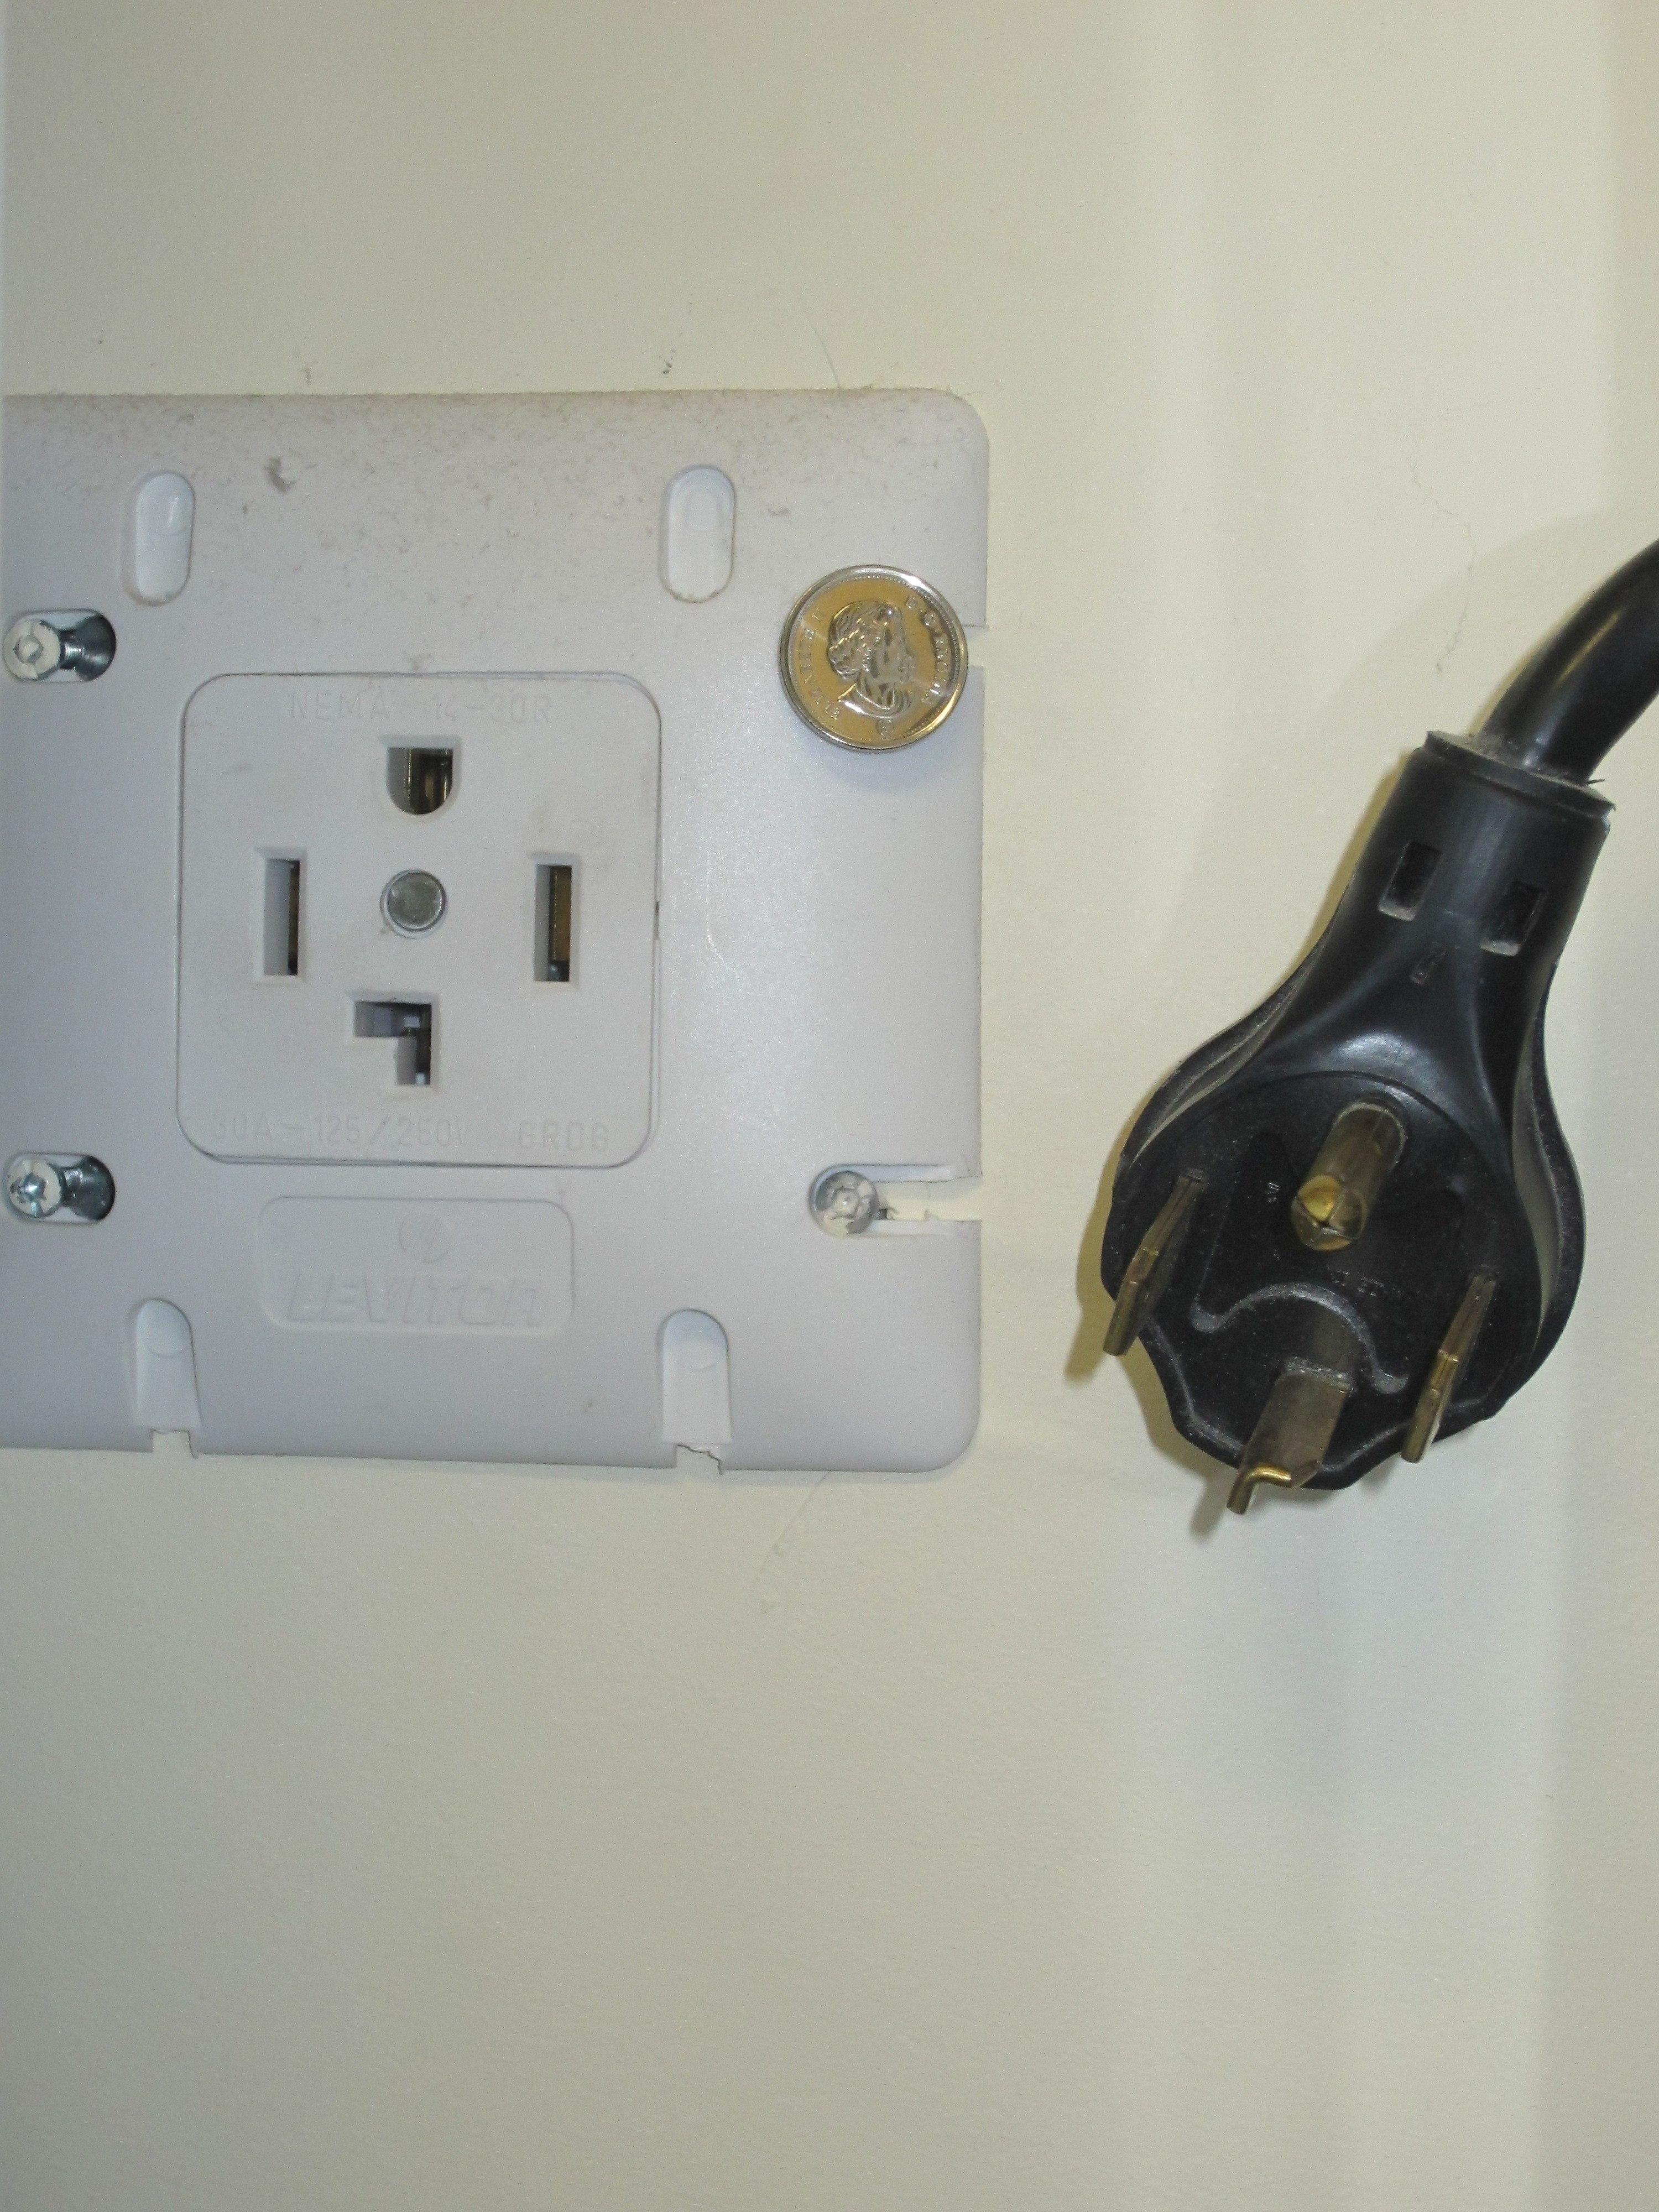 file nema 14 30 dryer receptacle jpg wikimedia commonsfile nema 14 30 dryer receptacle jpg